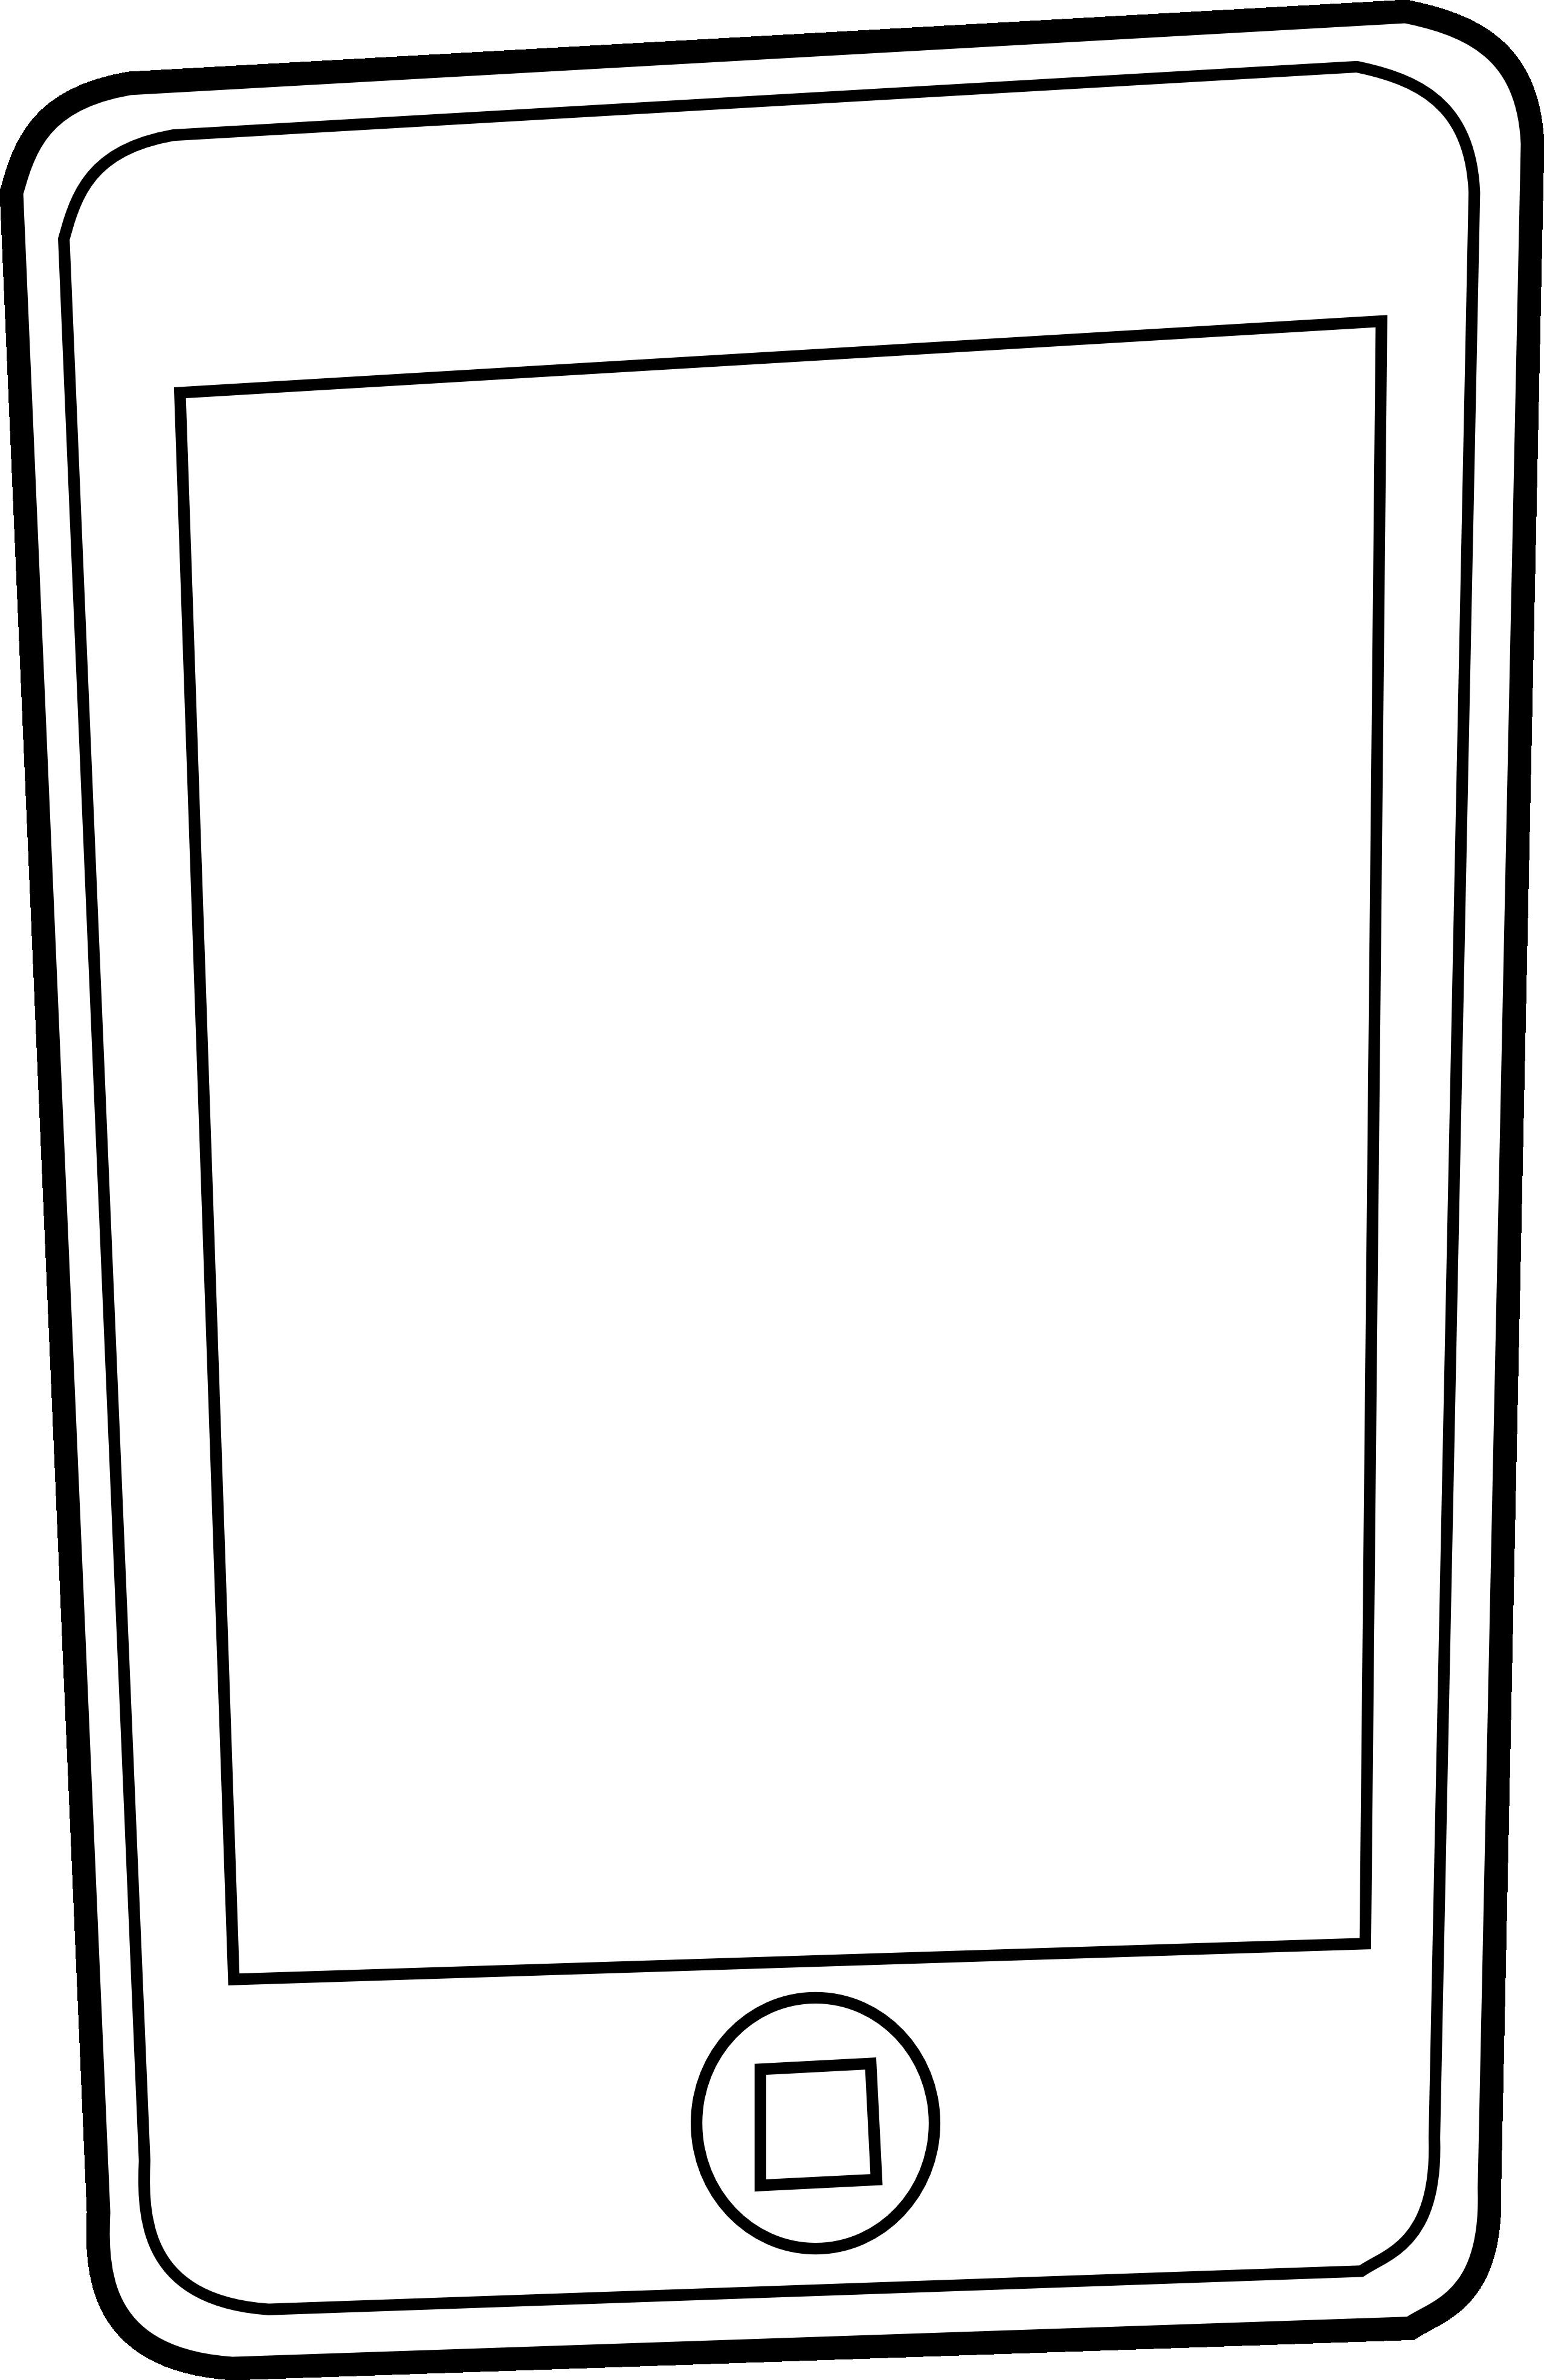 Iphone clipart border Ipad (61+) and clip black